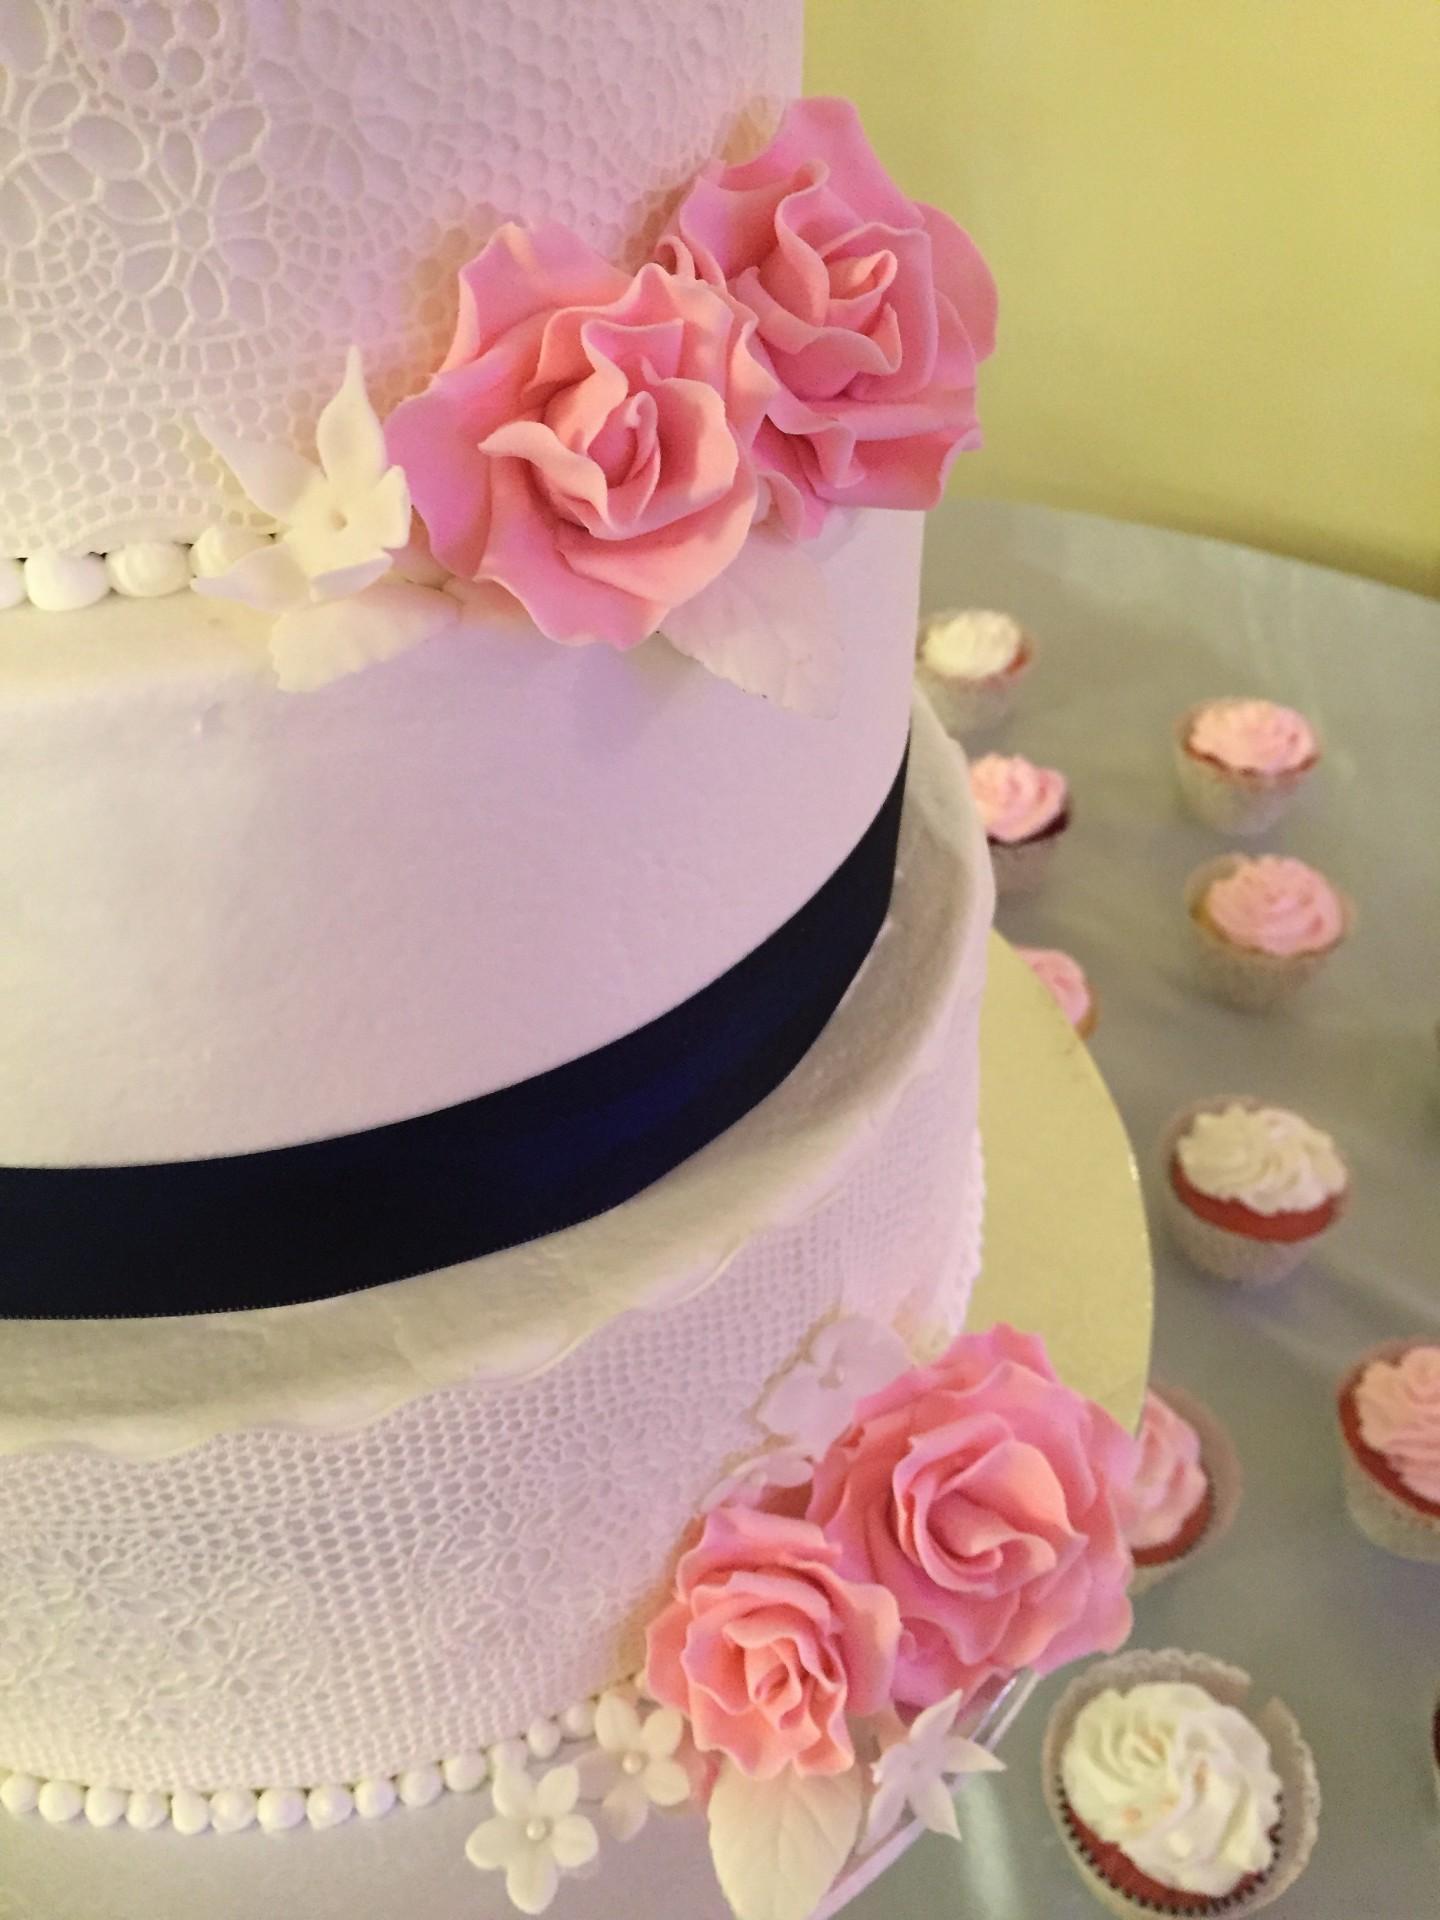 Edible lace and sugar roses